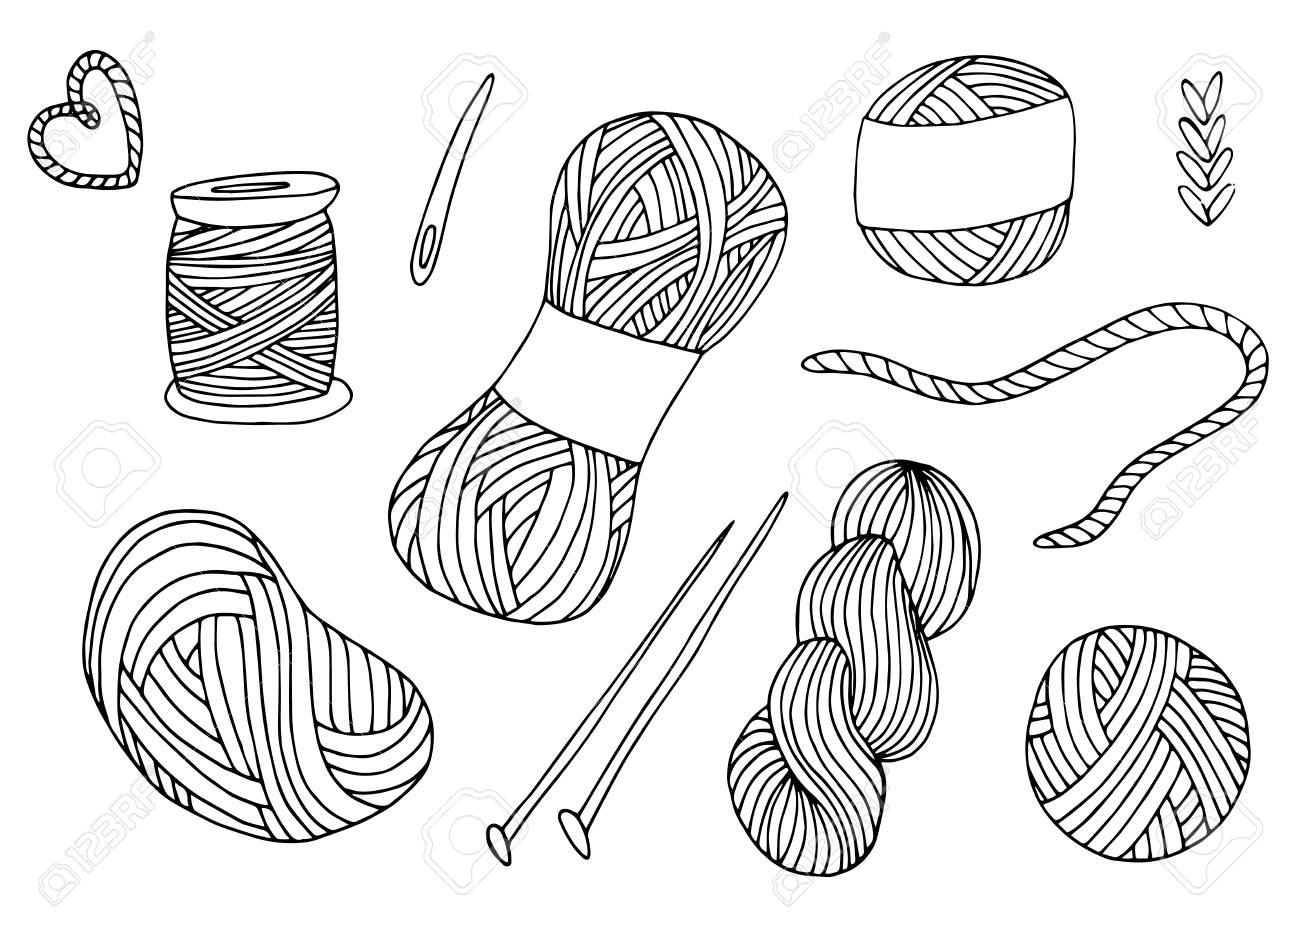 Knitting yarn balls set in hand drawn style. - 115364900